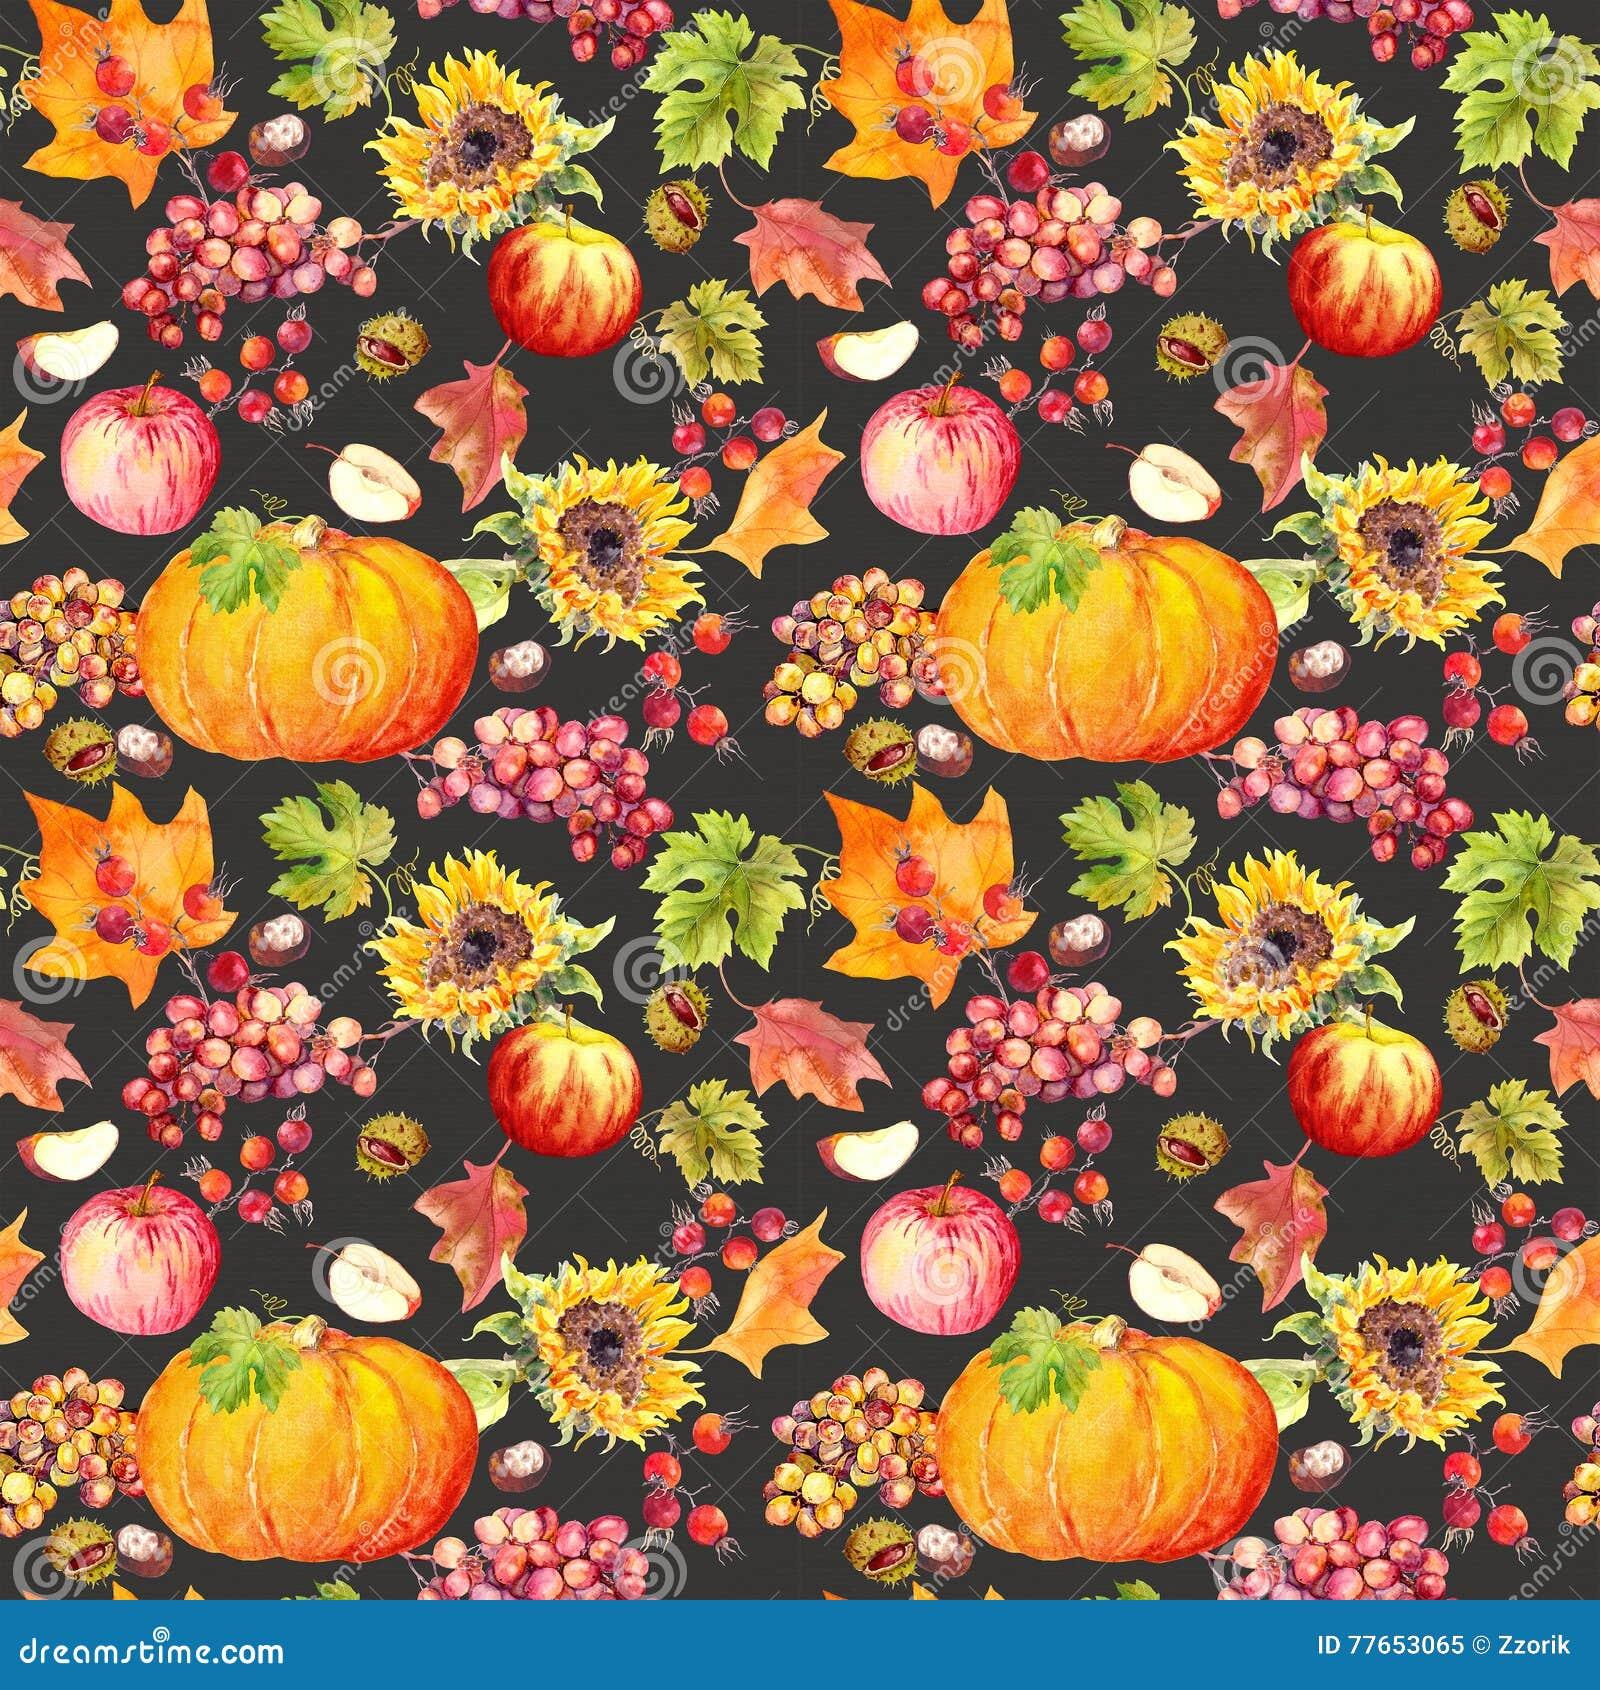 Thanksgiving Flowers Wallpaper: Thanksgiving Seamless Background. Fruits, Vegetables